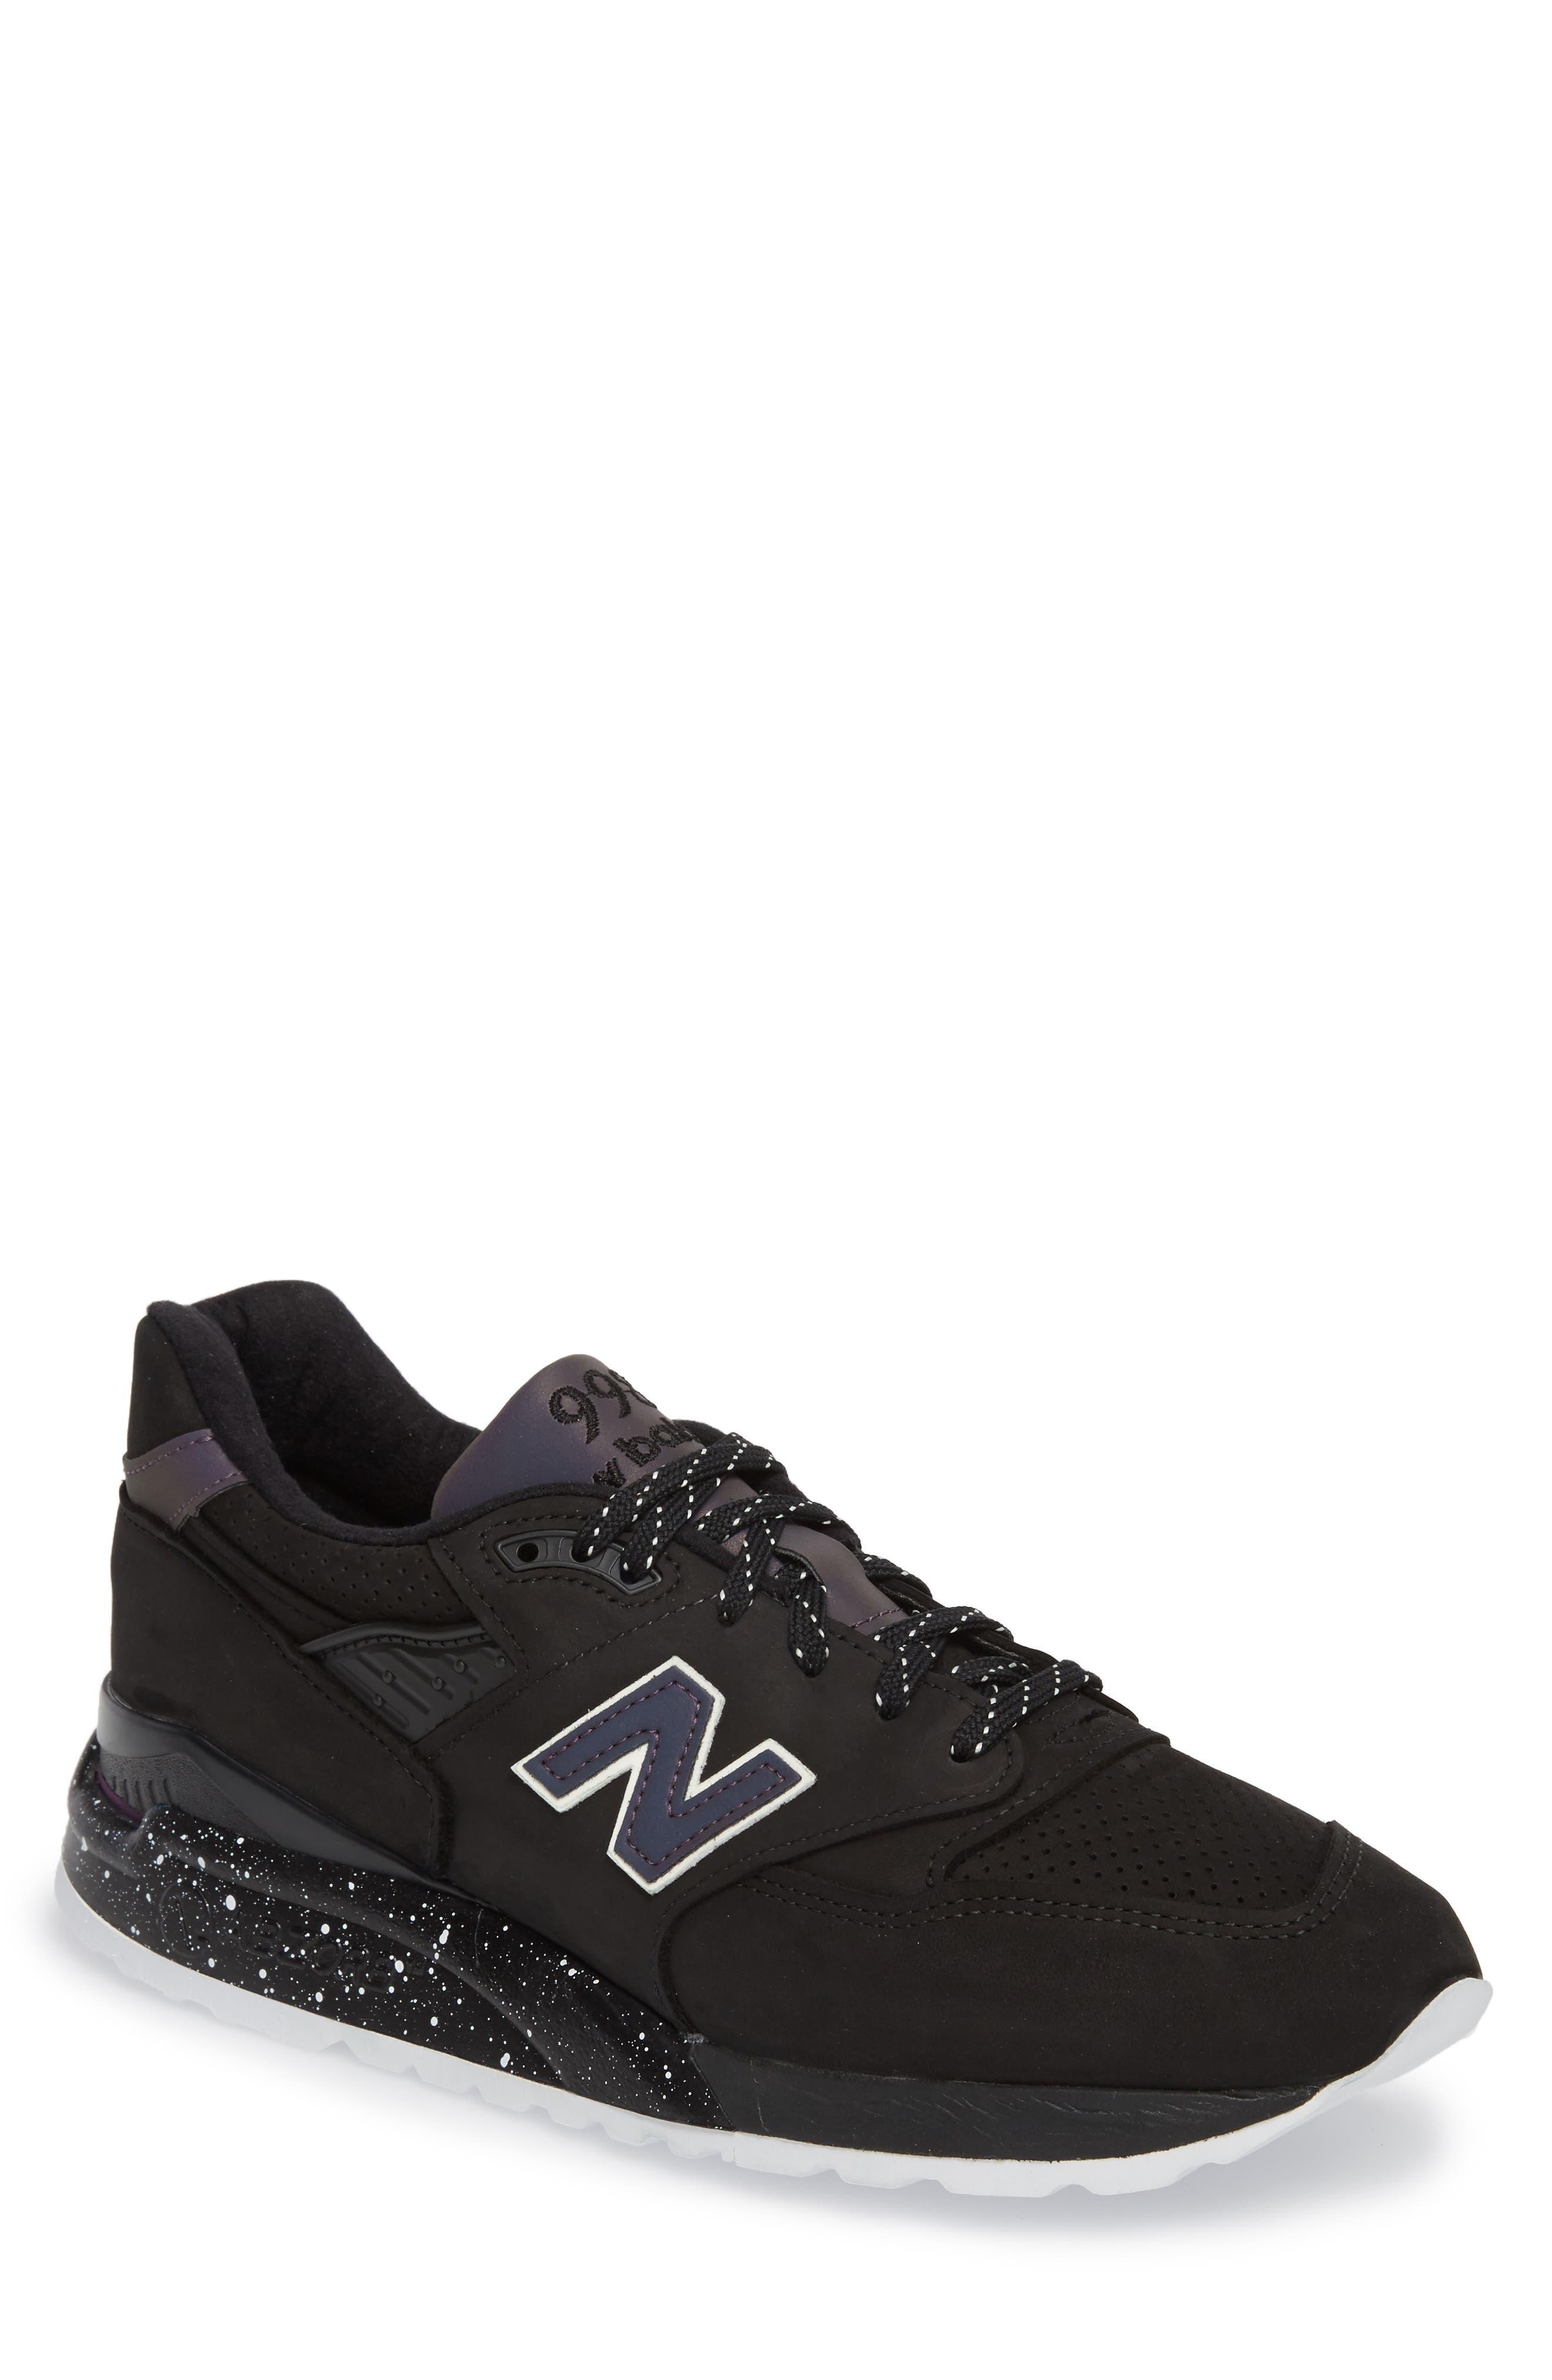 Alternate Image 1 Selected - New Balance 998 Sneaker (Men)